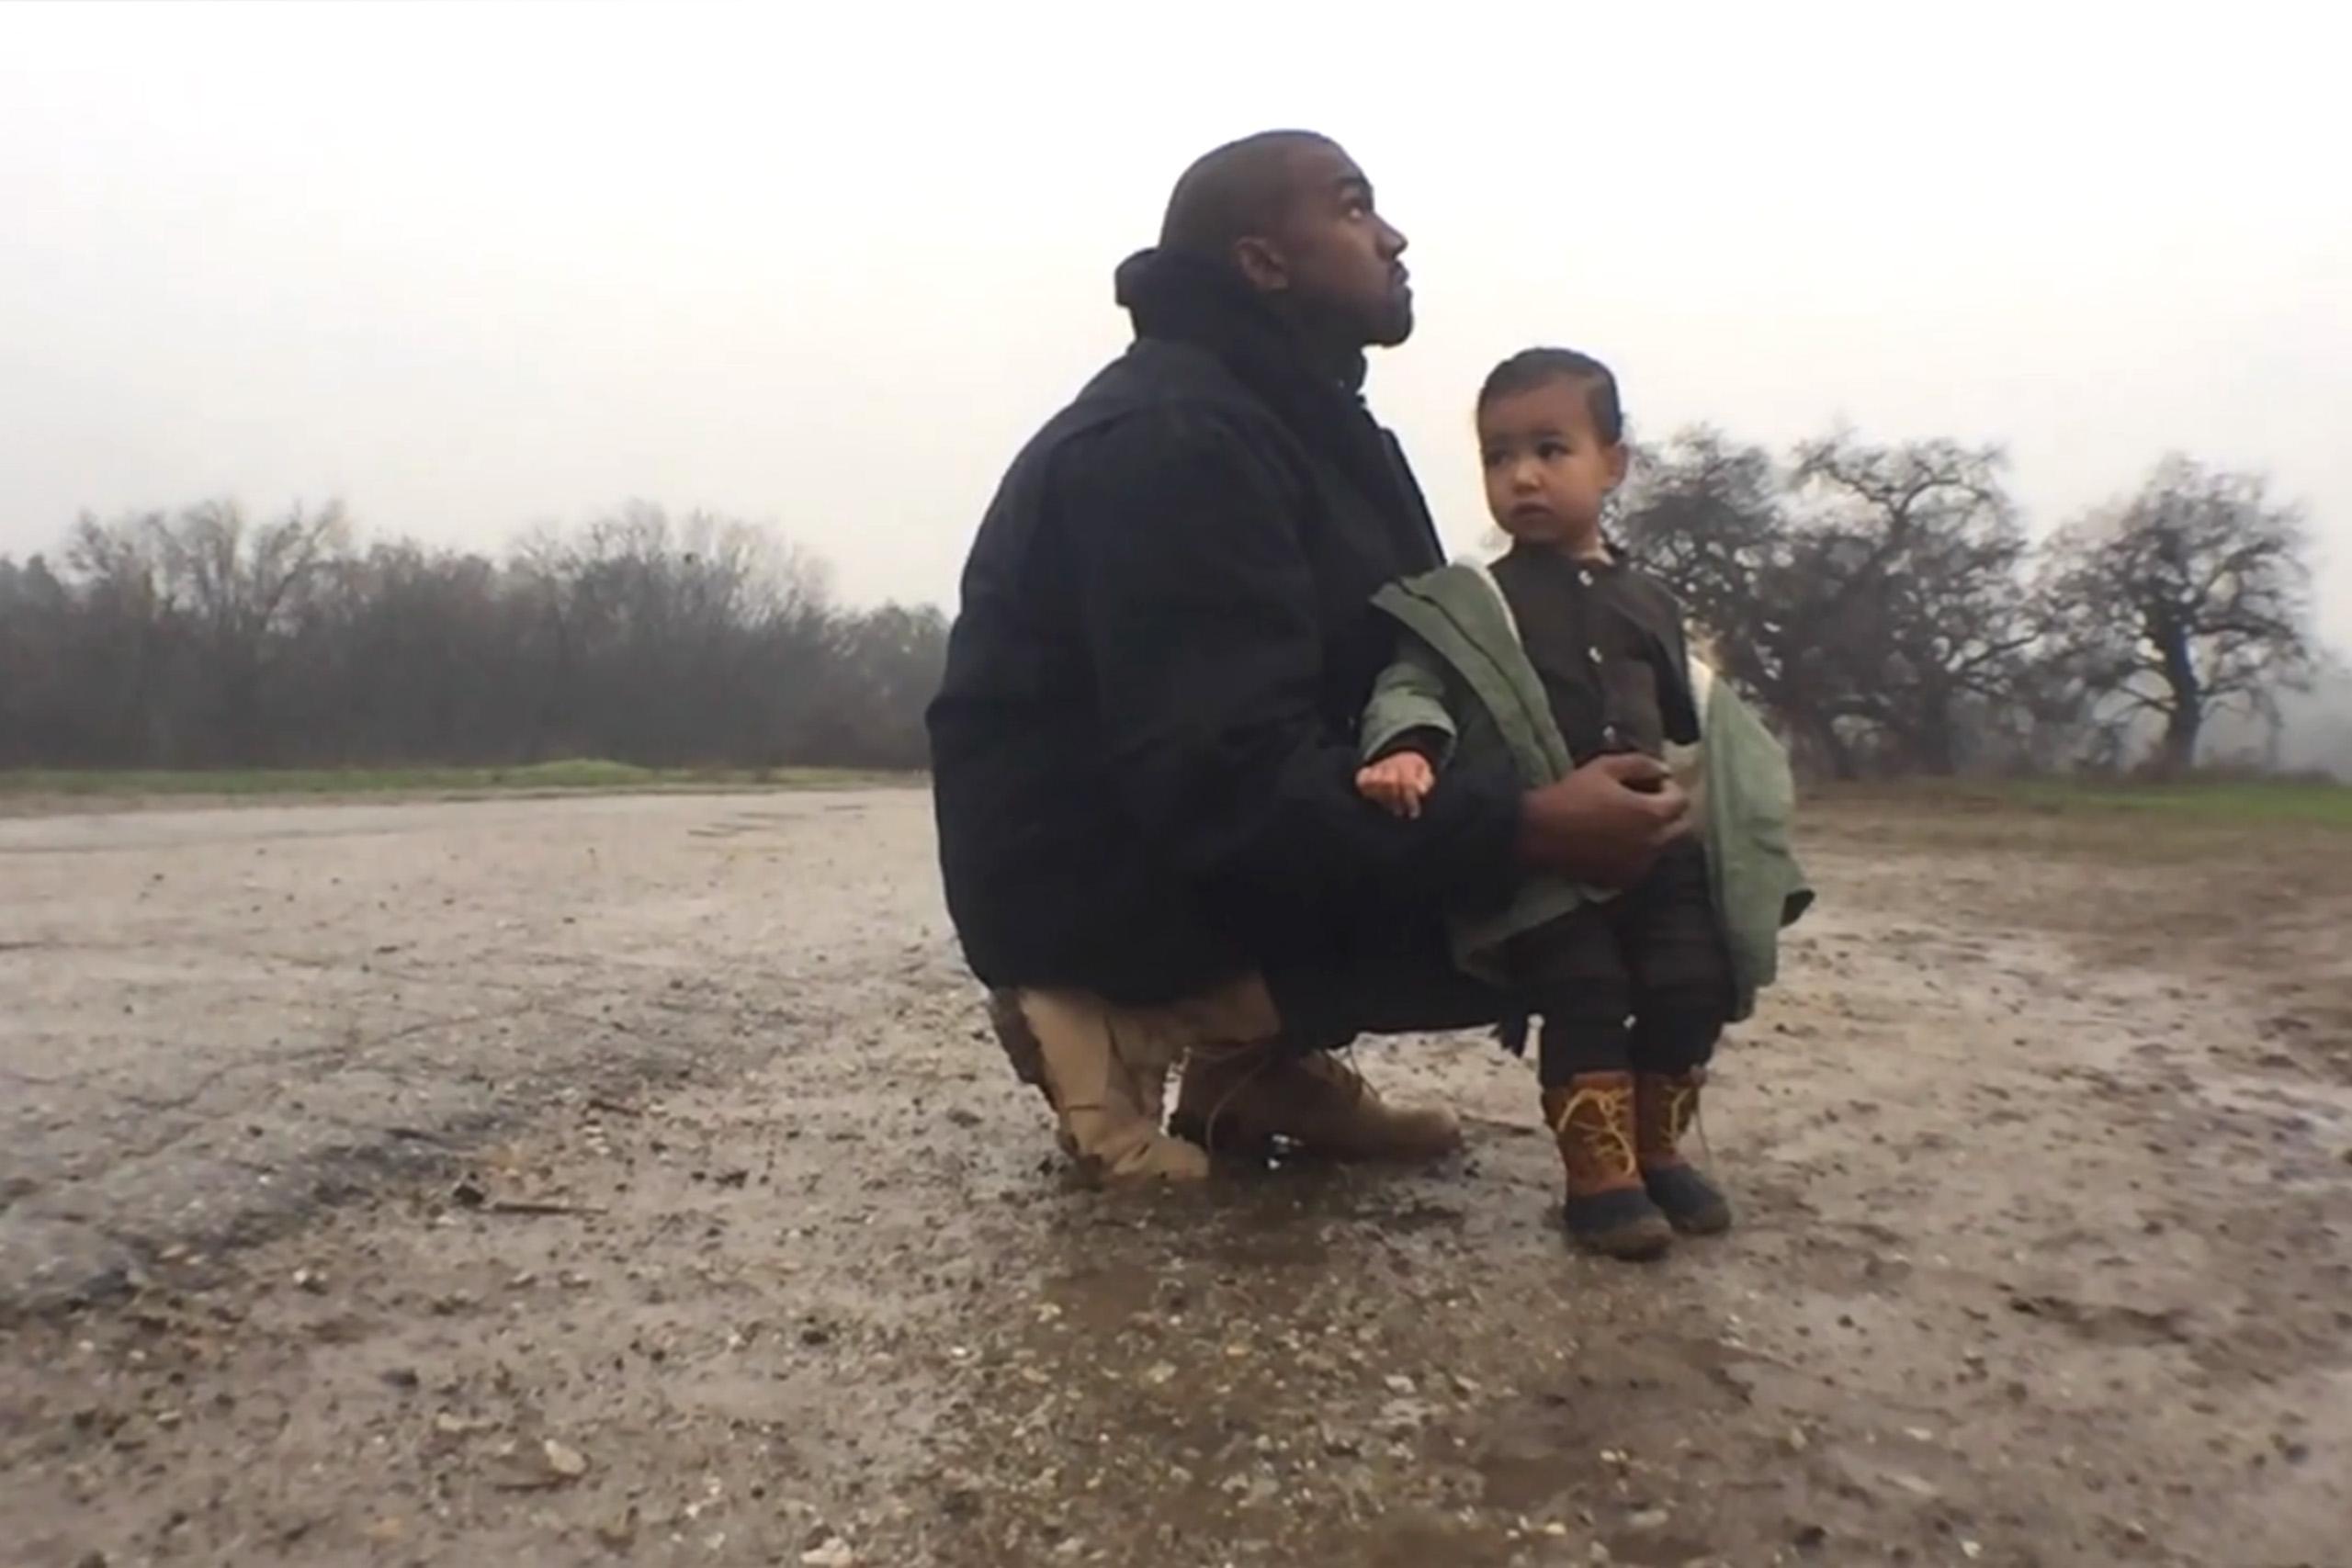 quanto grande è Kanye Wests pene